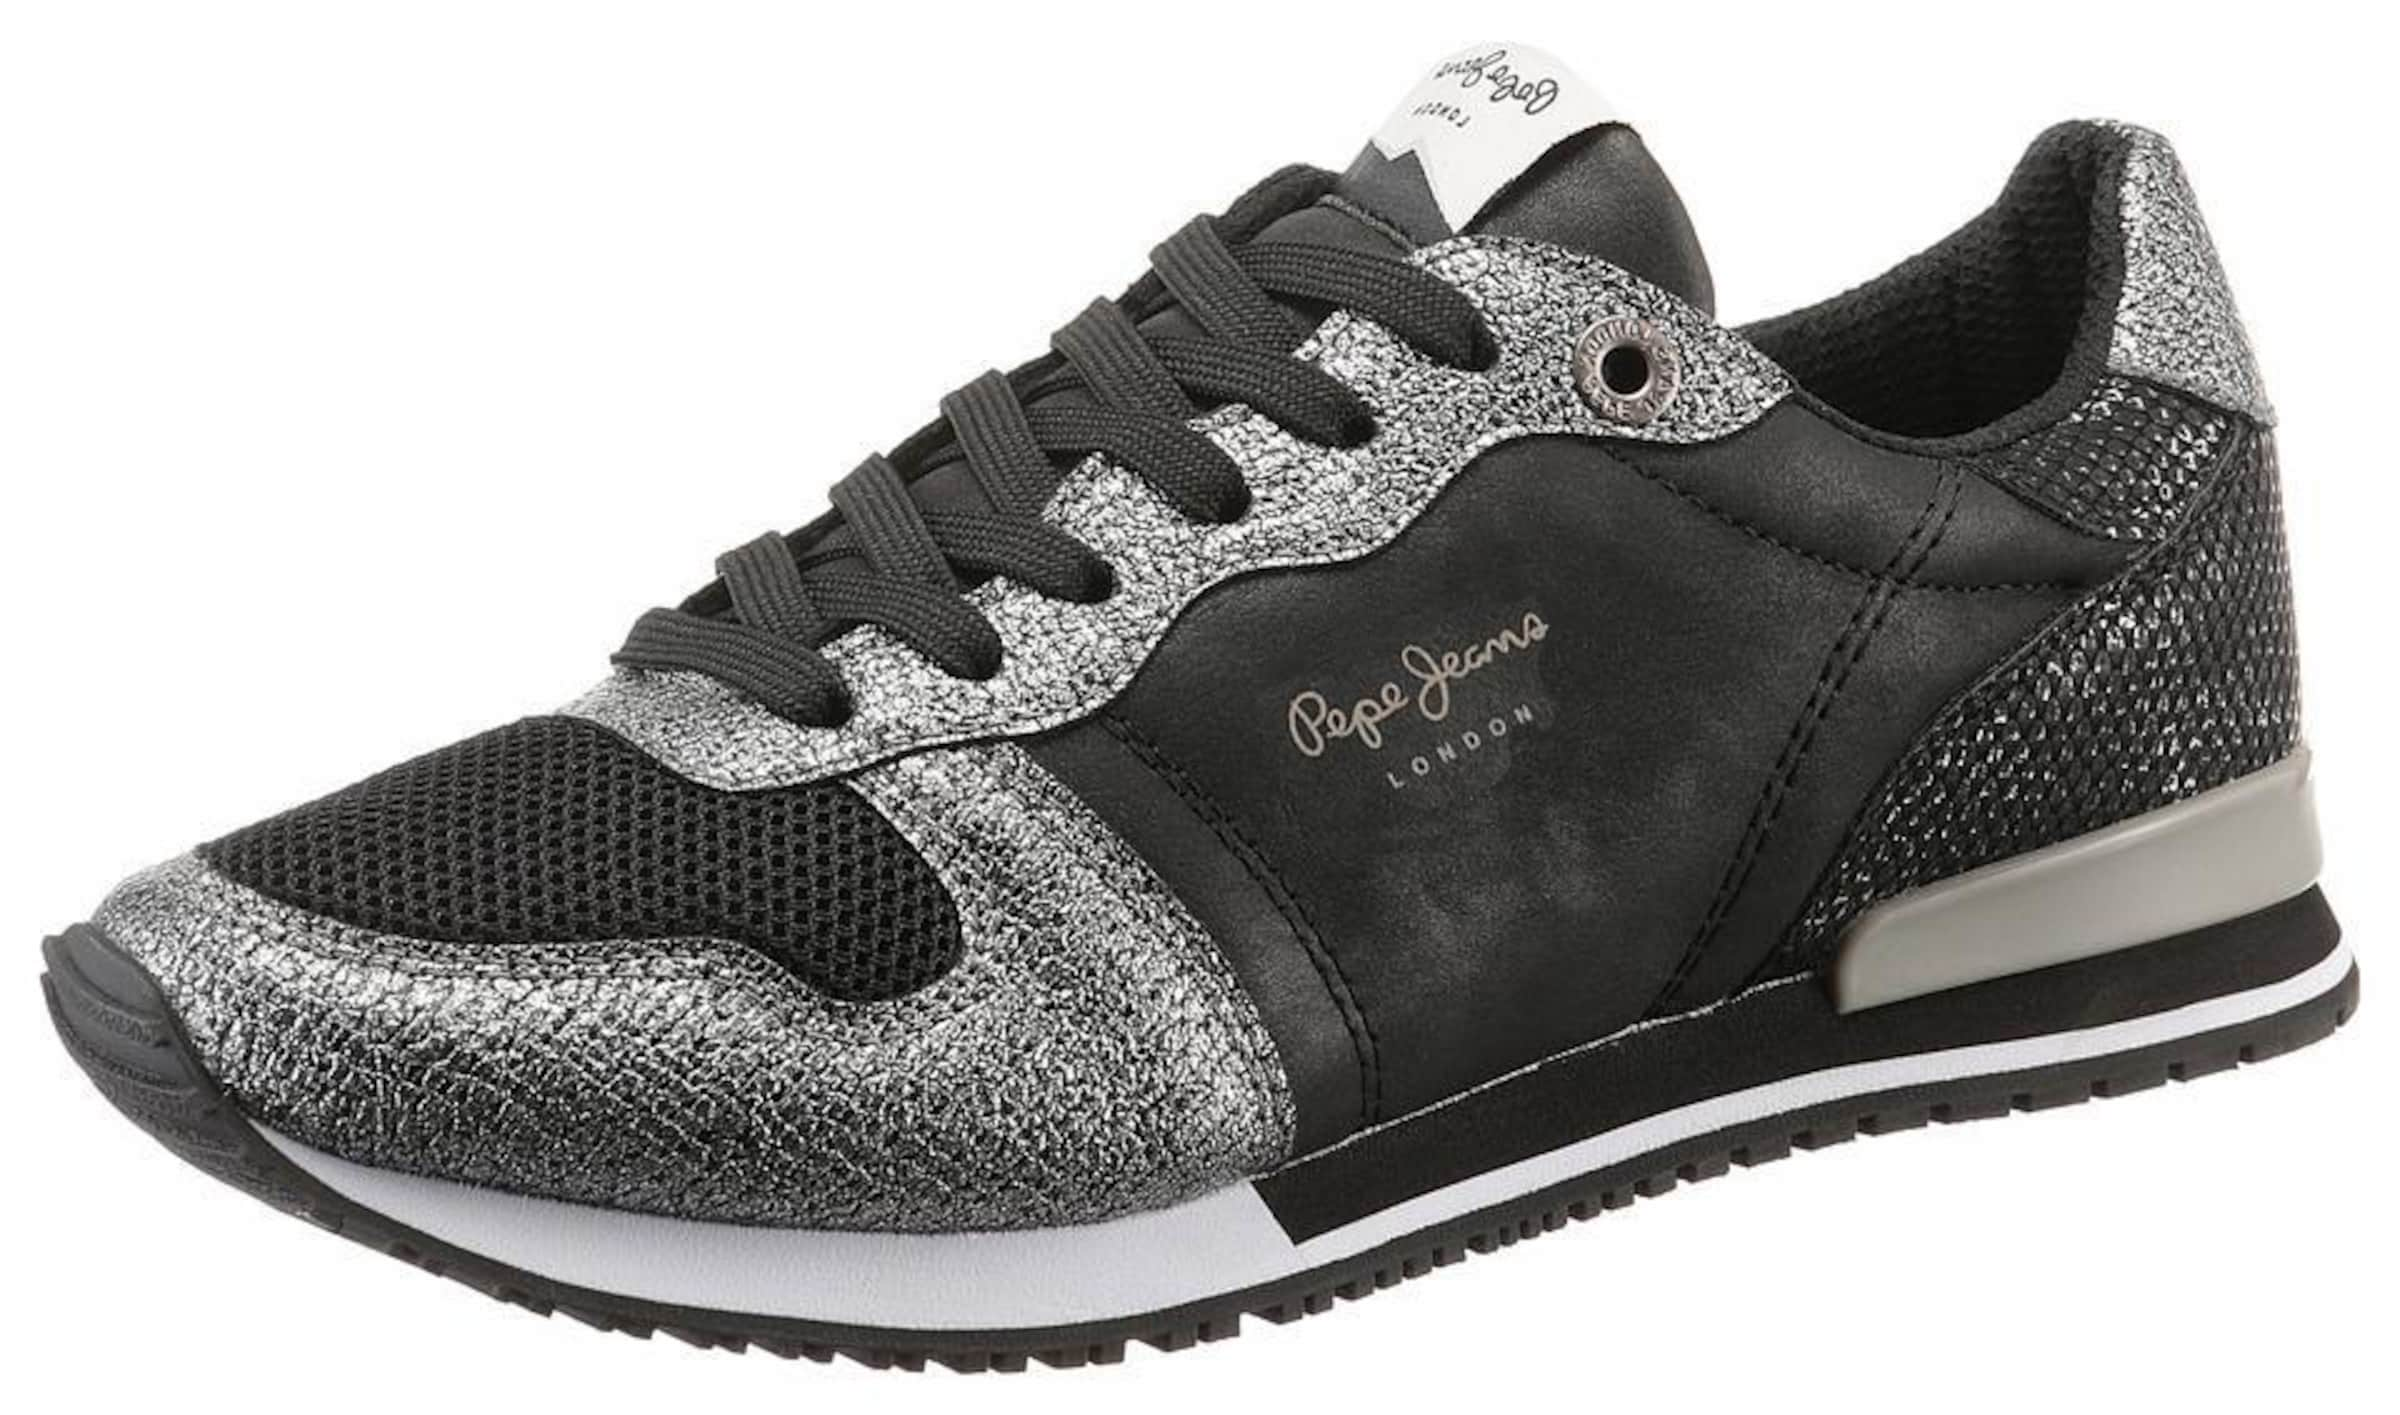 Pepe Jeans Sneaker Gable Top Hohe Qualität